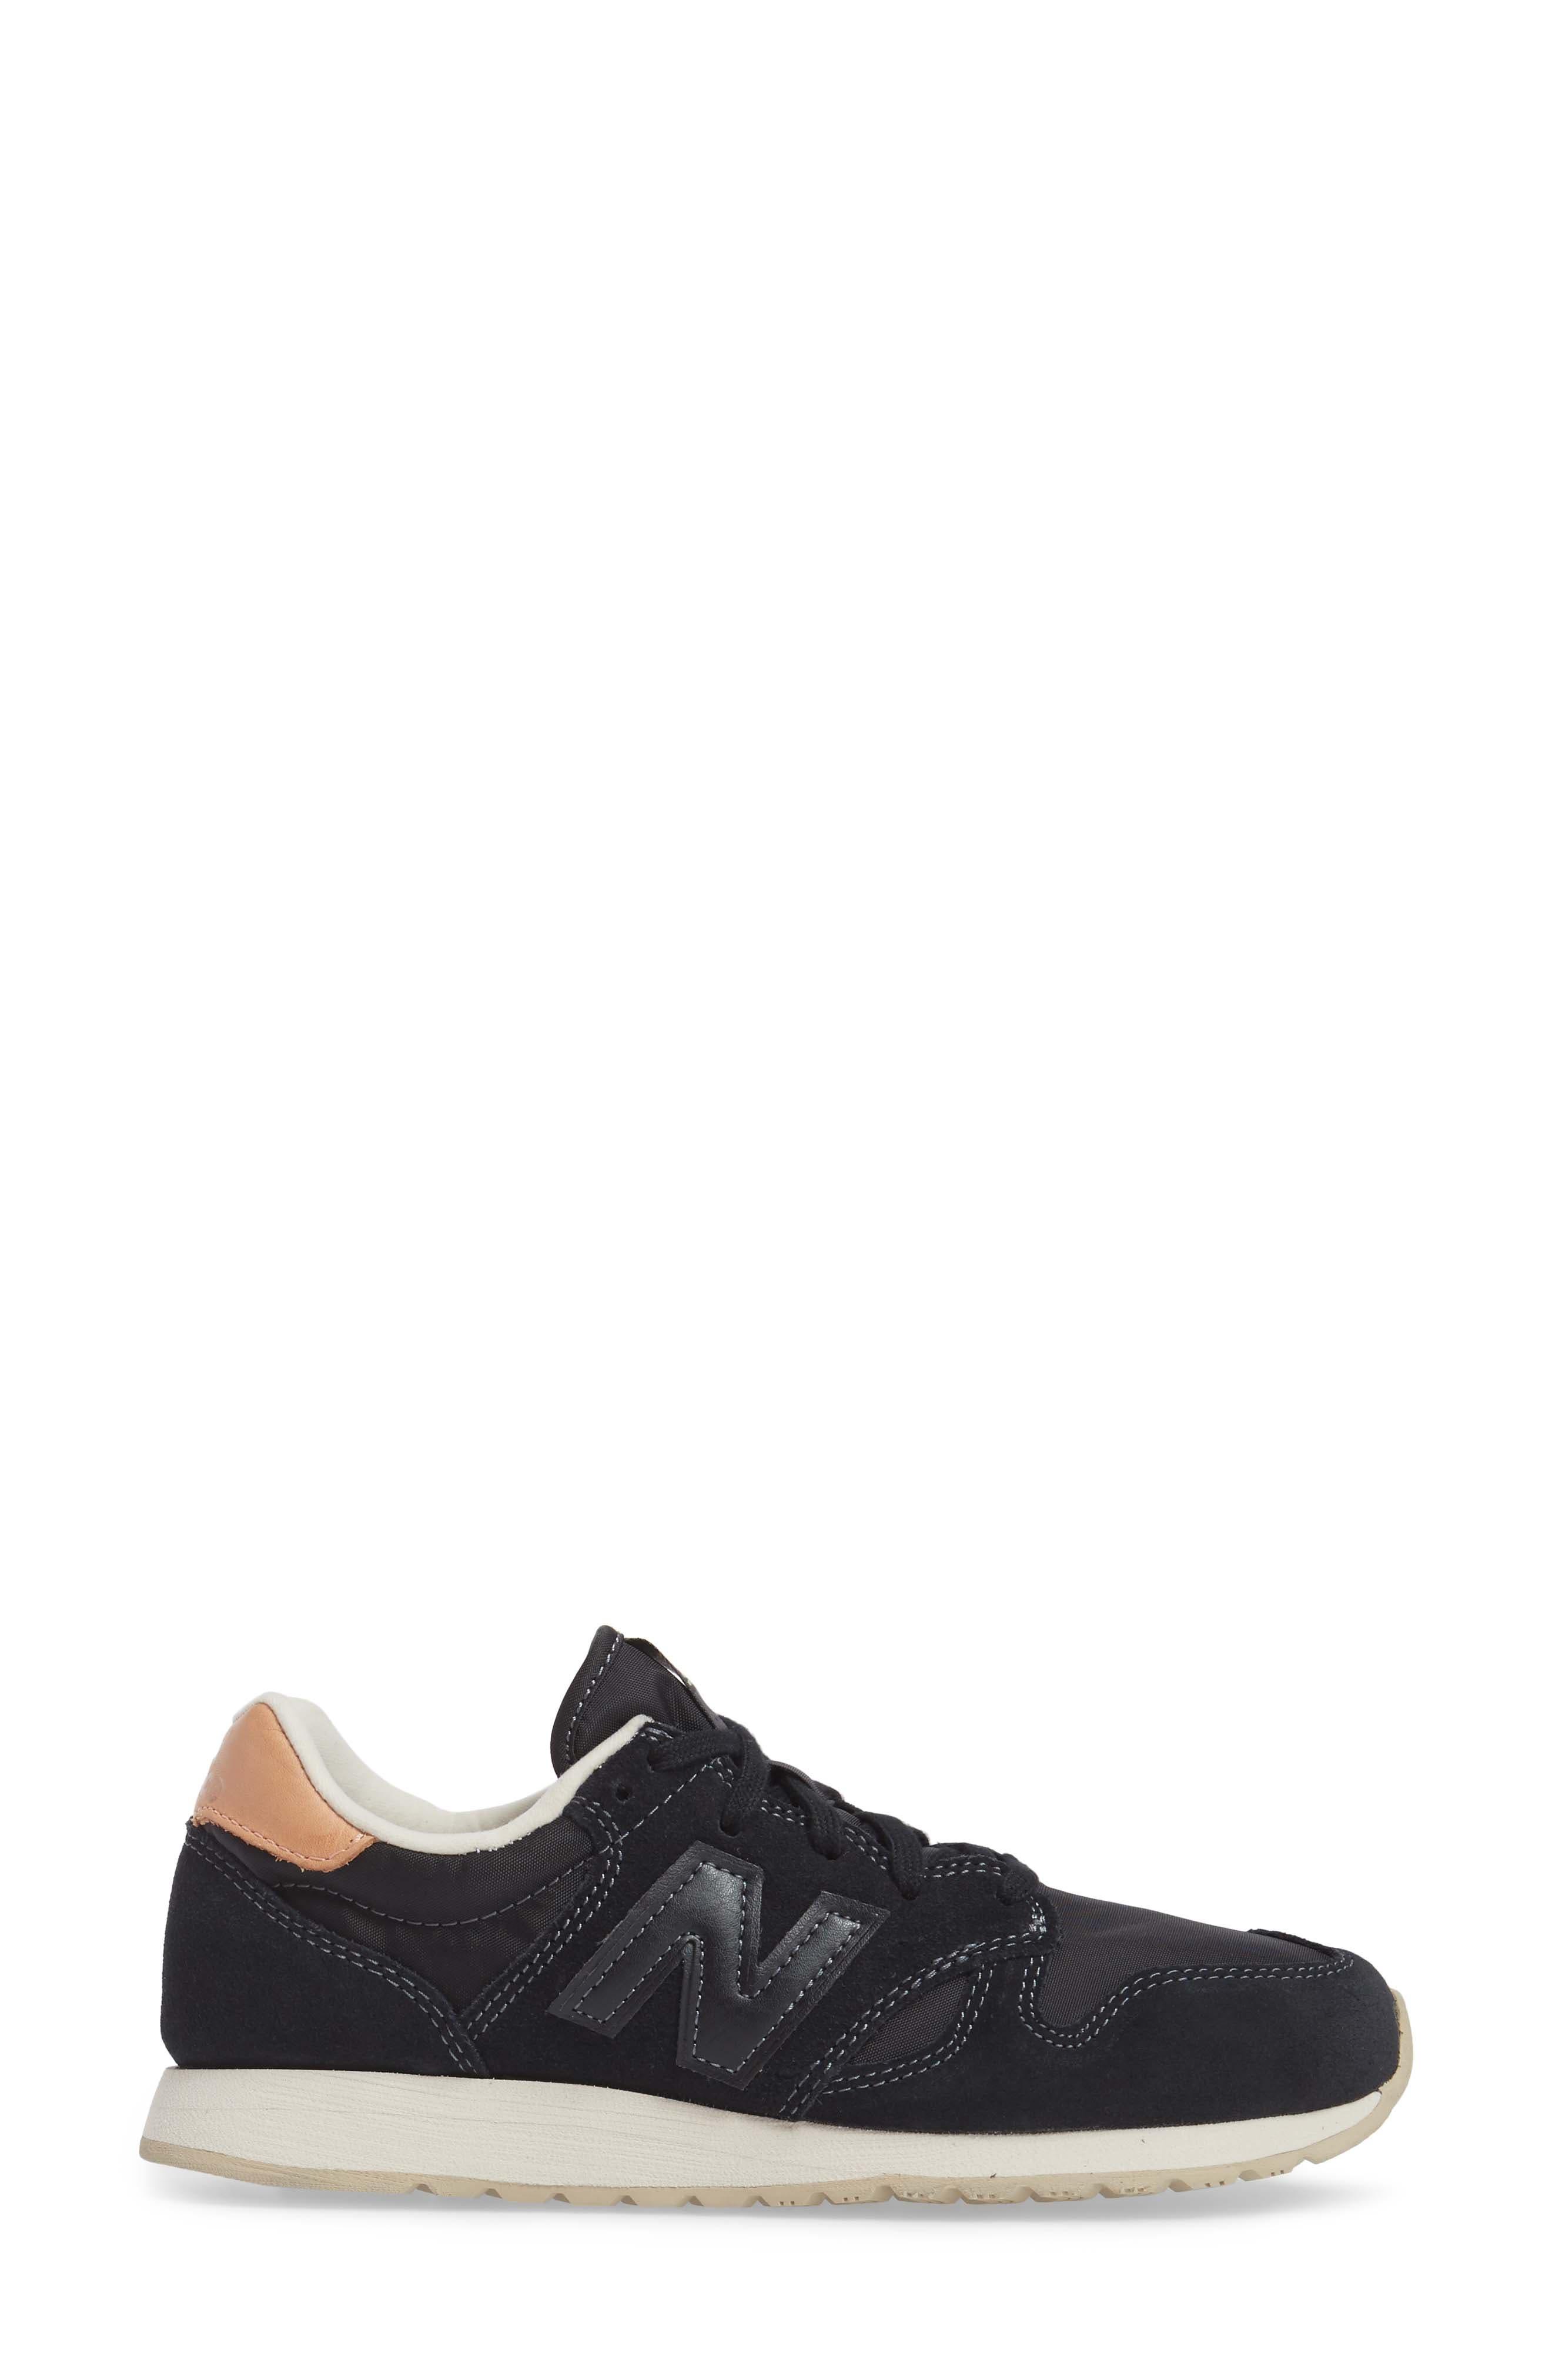 Alternate Image 3  - New Balance 520 Sneaker (Women)